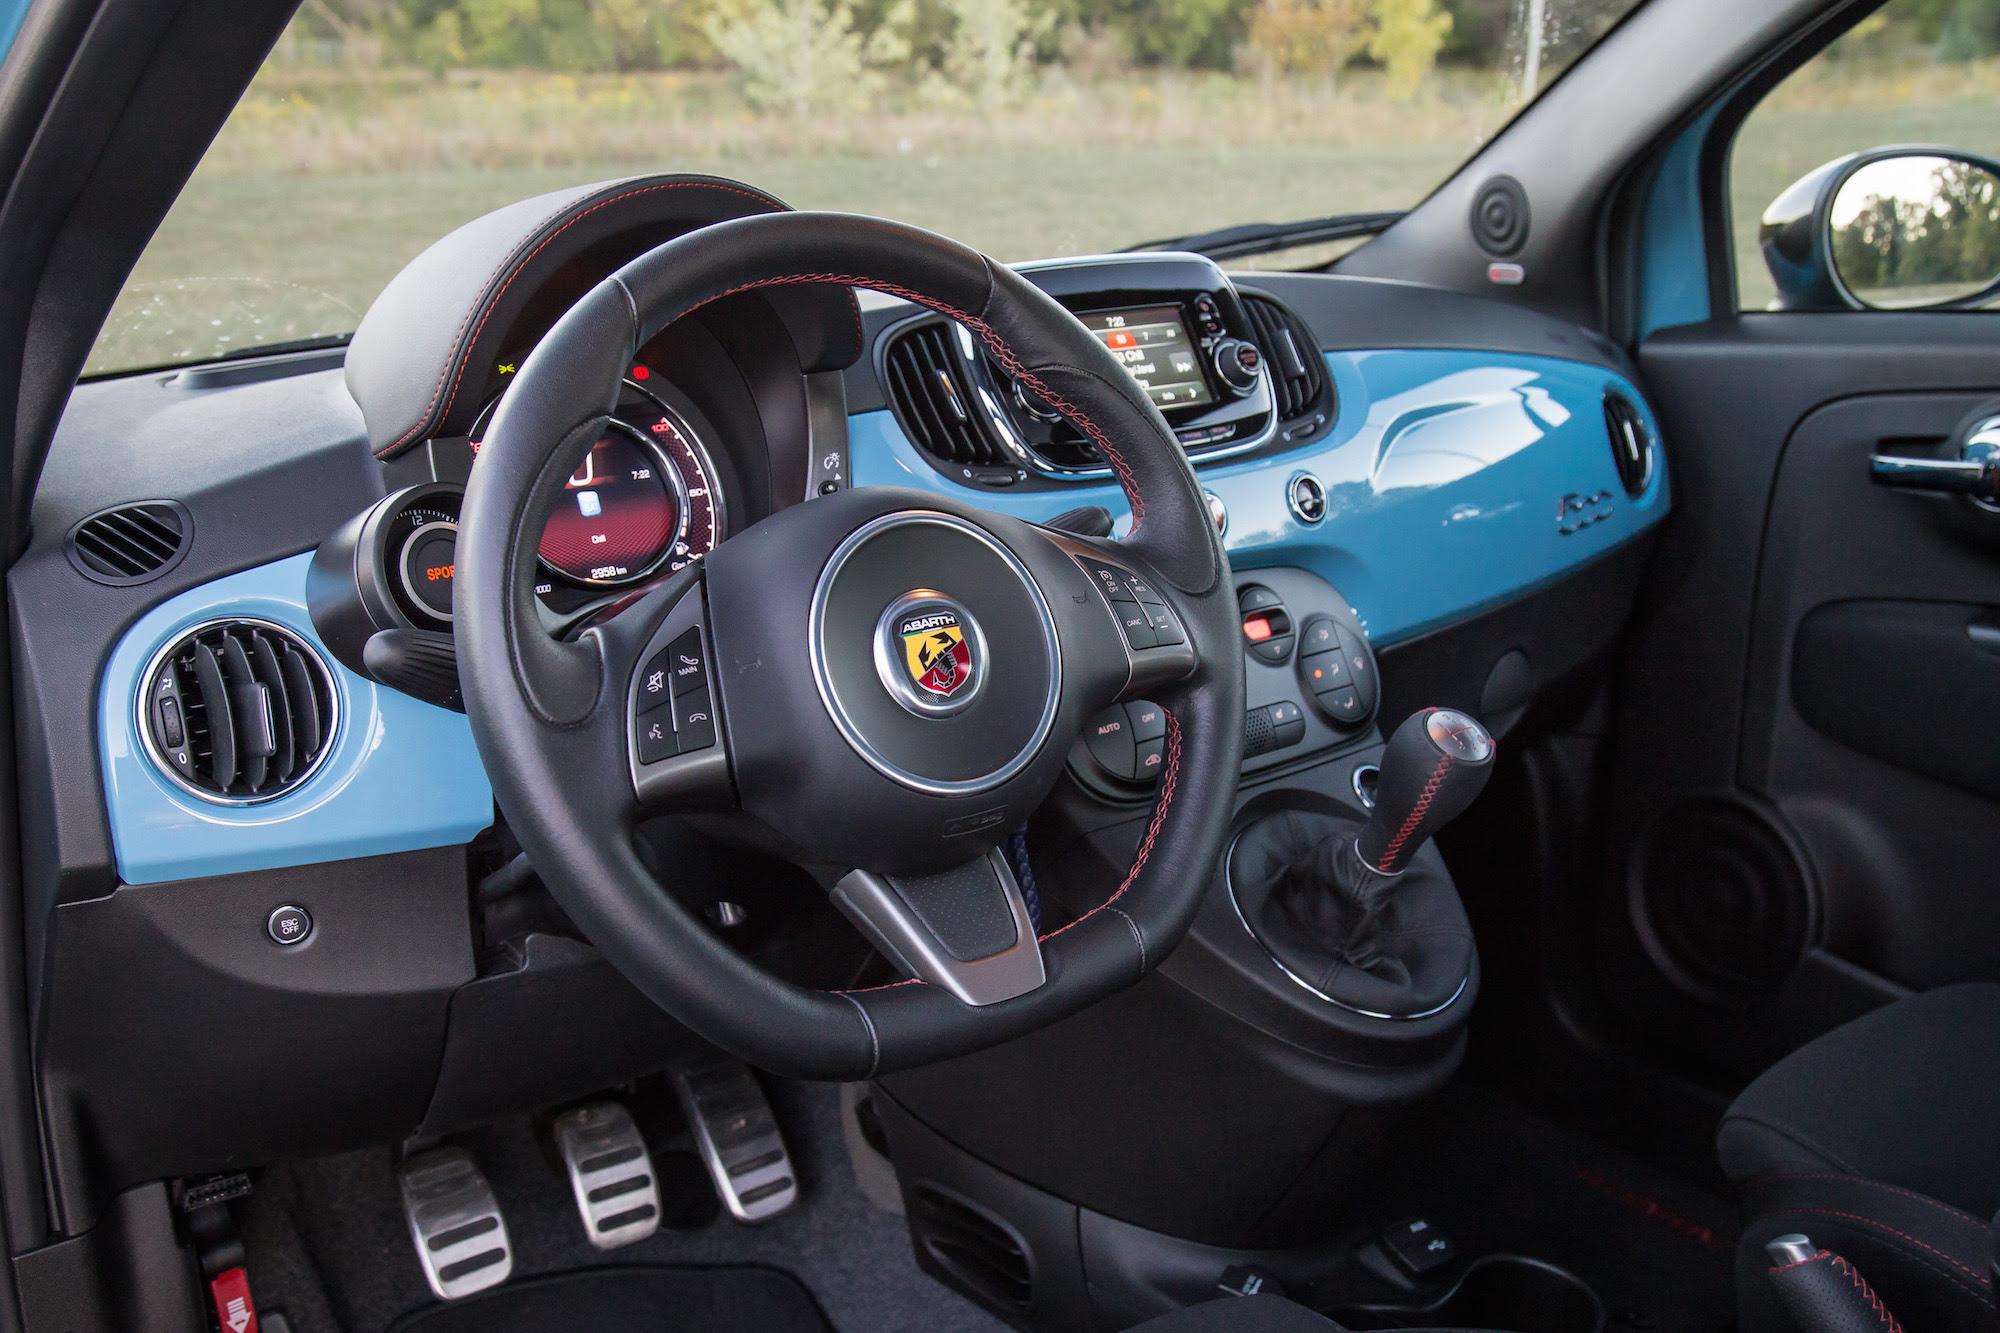 2016 Fiat 500 Abarth >> Fiat 500 Abarth Fiat 500 Abarth Tricolore